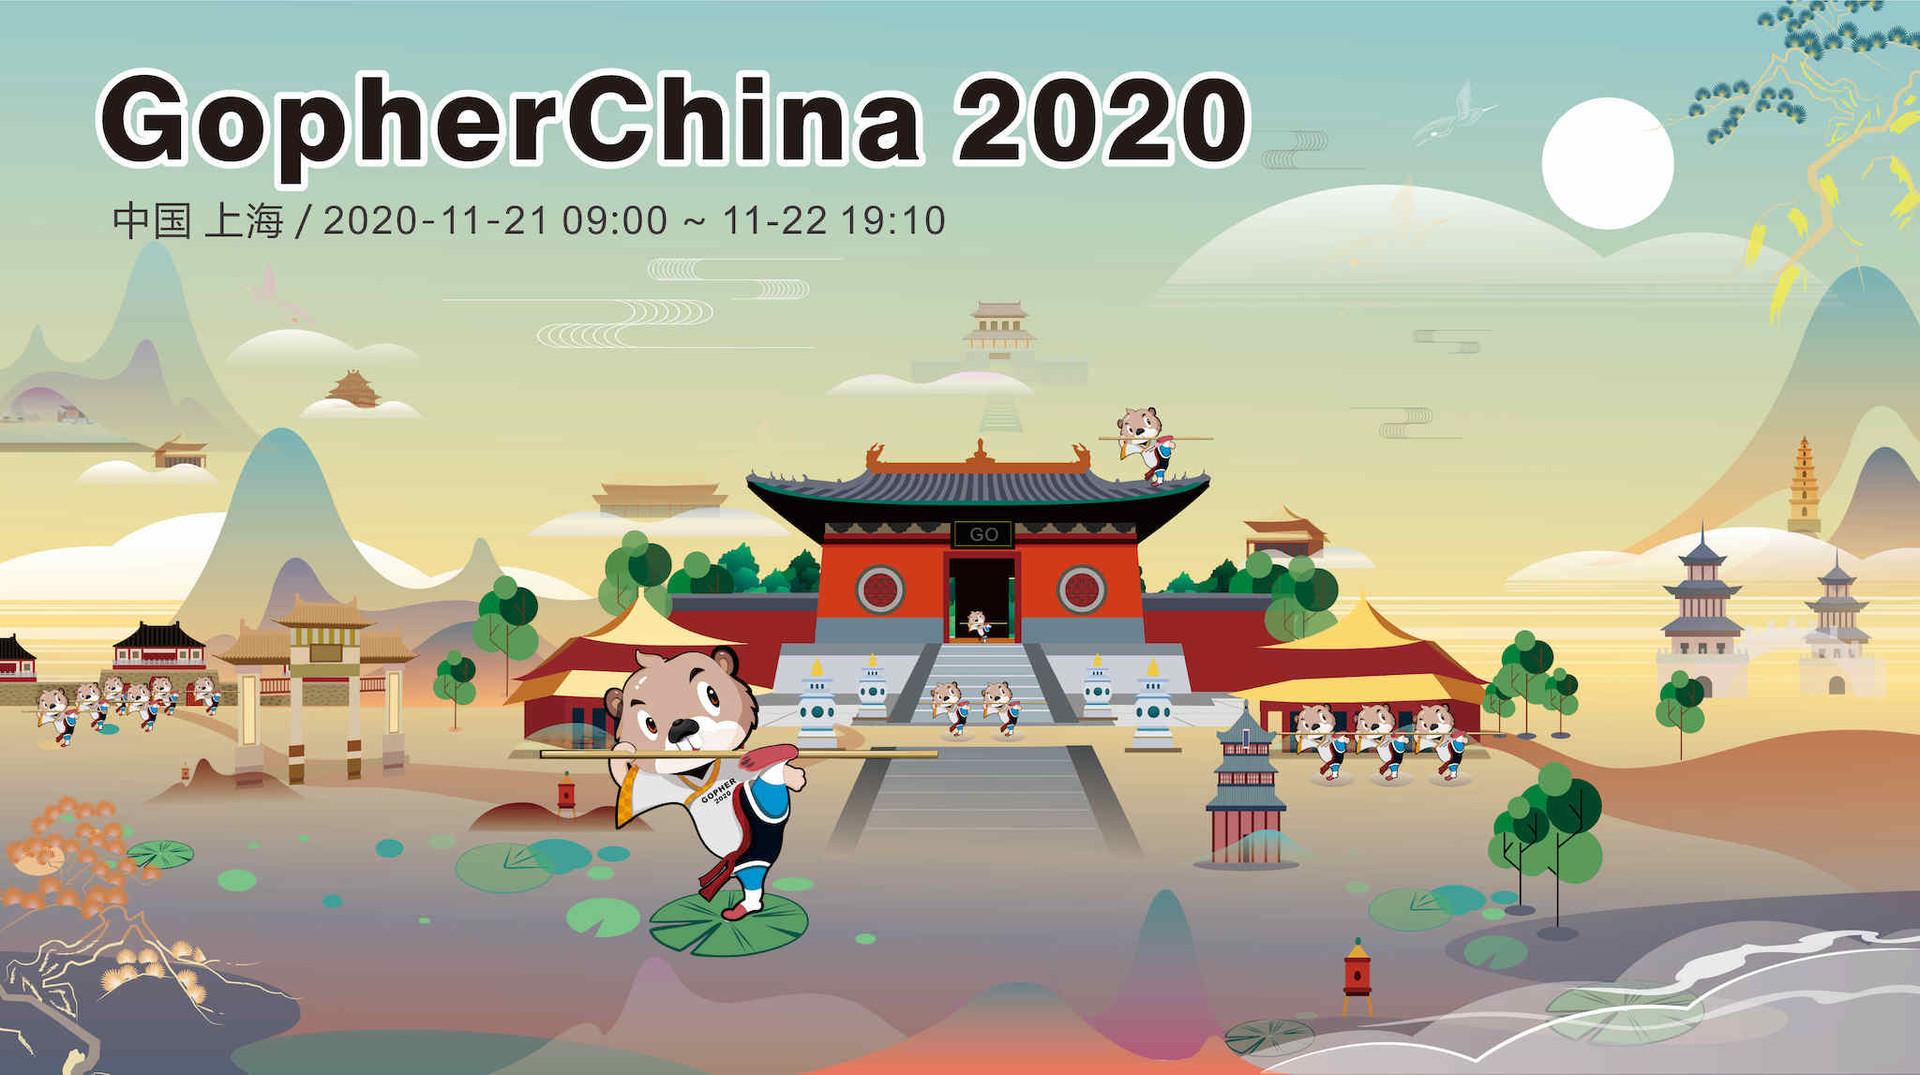 GopherChina 2020 大会